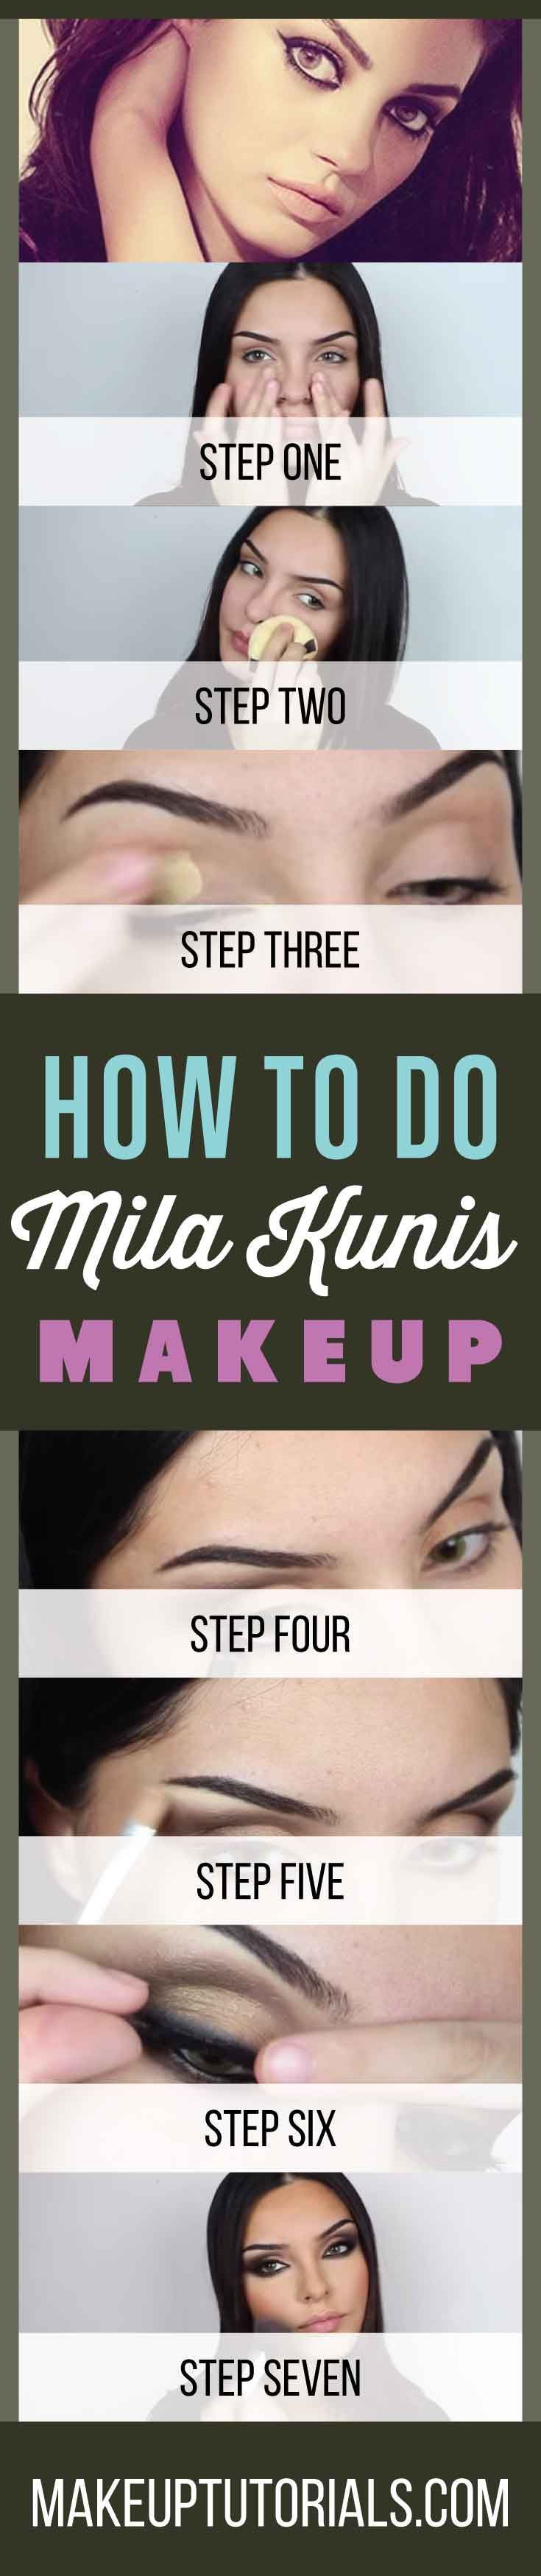 How To Do Mila Kunis Makeup Tutorials | Easy DIY Makeup Ideas & Tips For Doing Y...